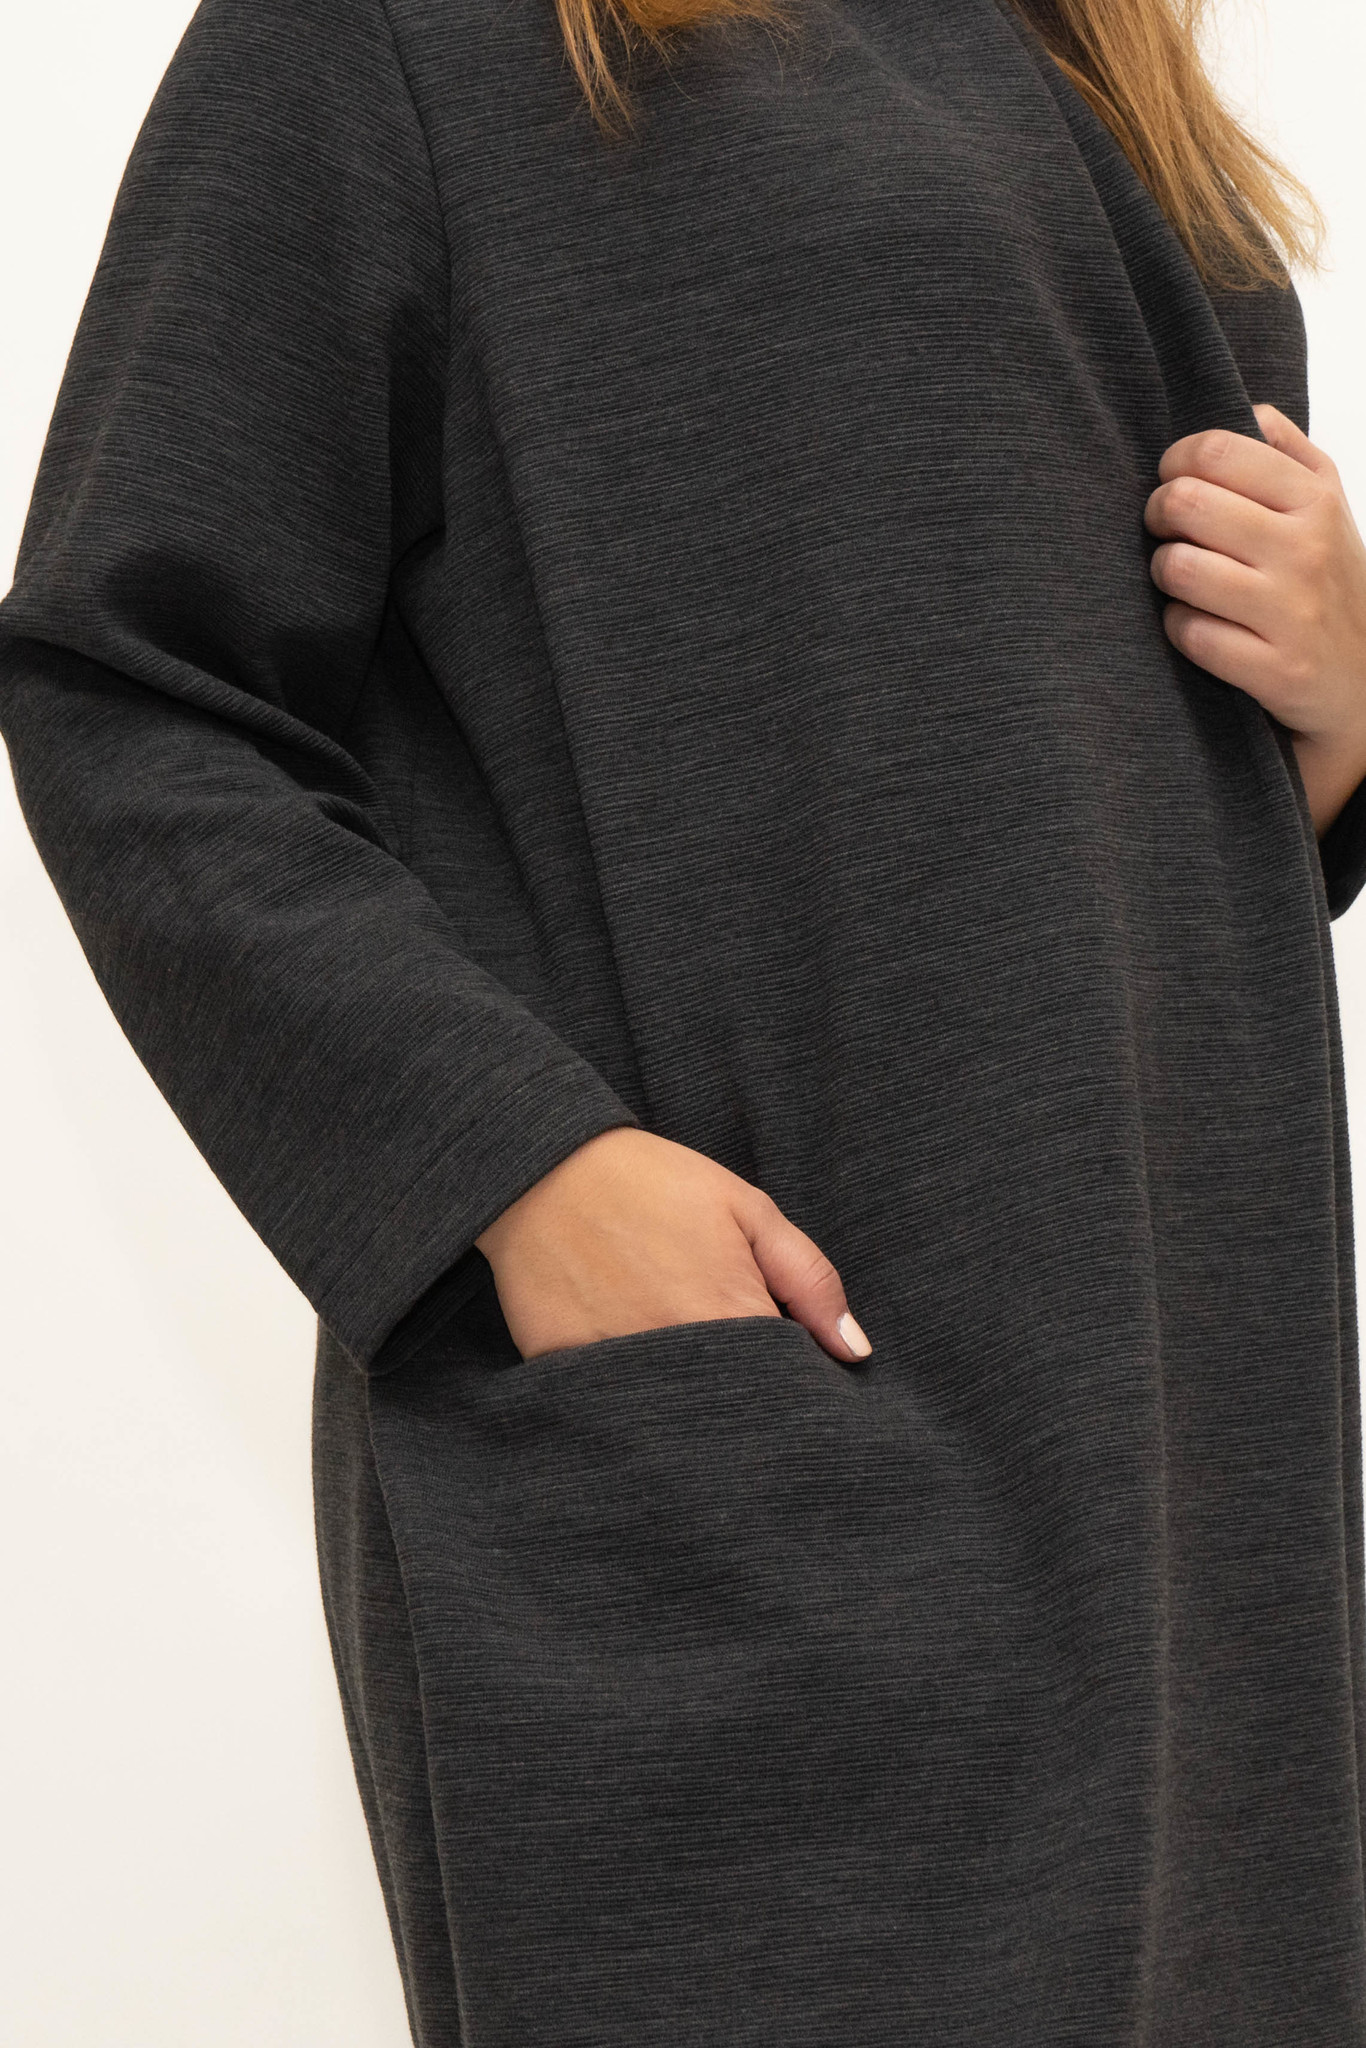 PHILIA Cardigan in Polyester-Virgin Wool blend-5